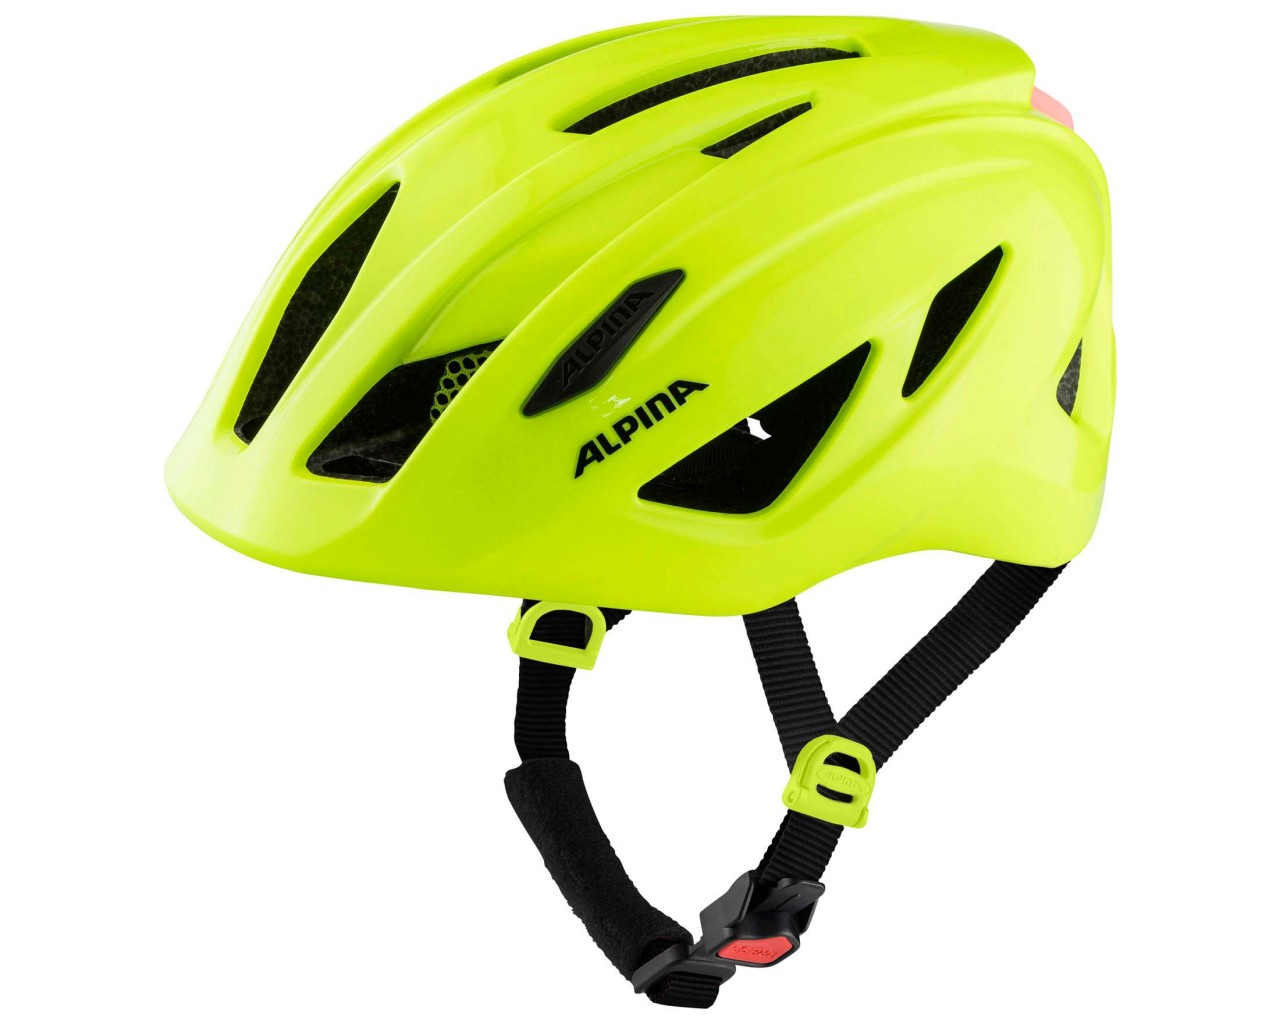 Alpina Pico Flash Kids Bike Helmet   be visible gloss 50-55